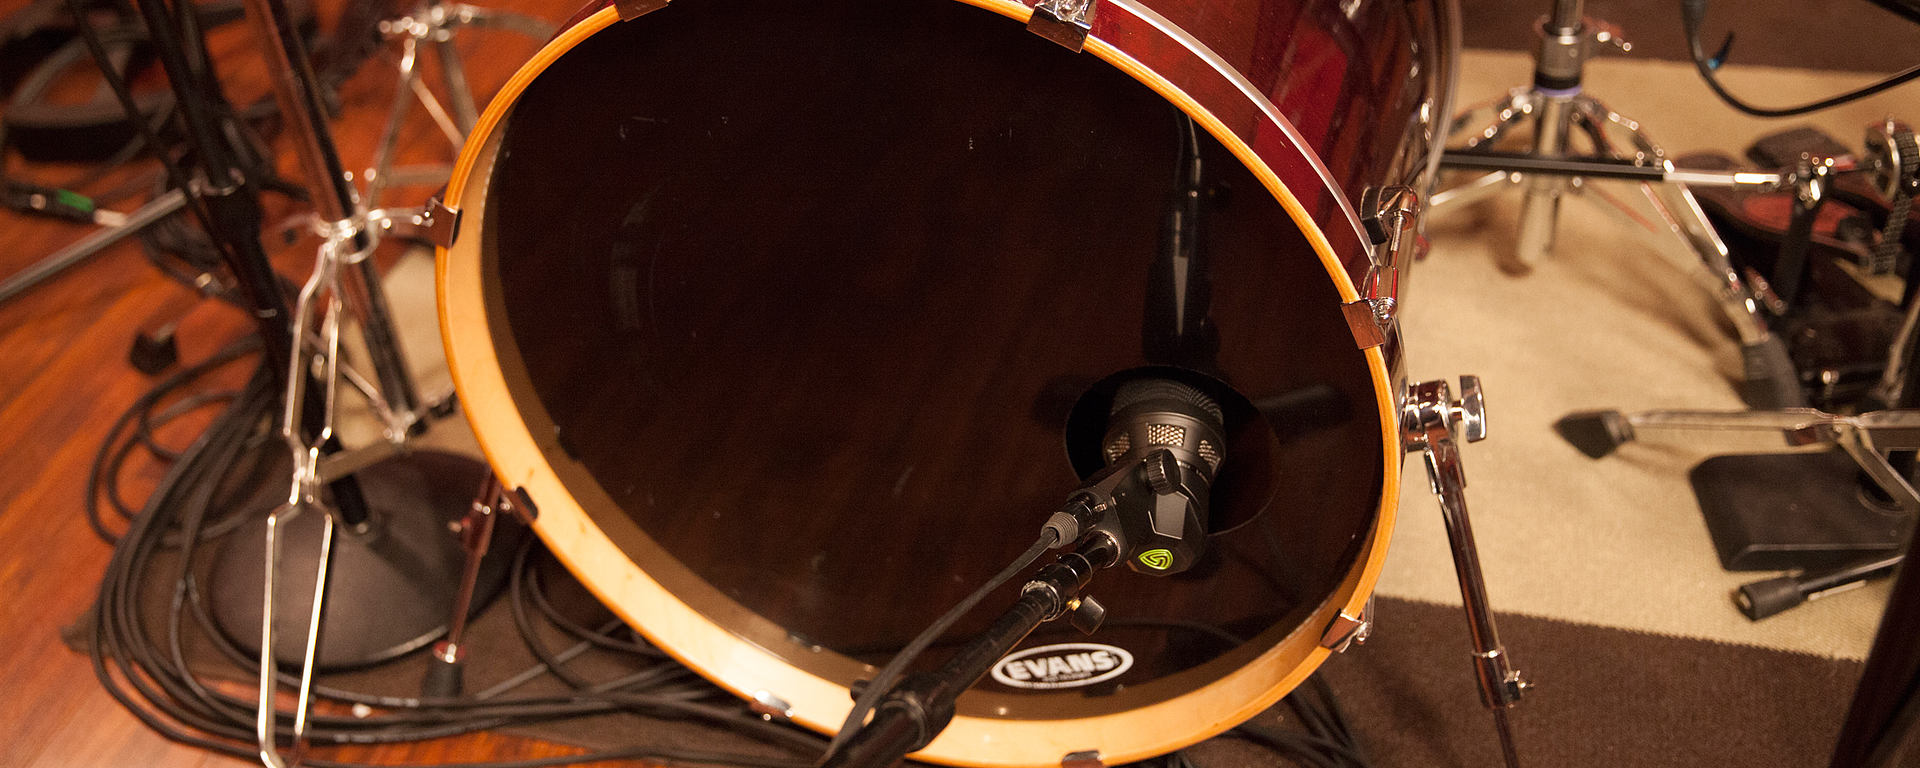 This image shows the DTP 640 REX dual element kick-drum microphone on a kick drum